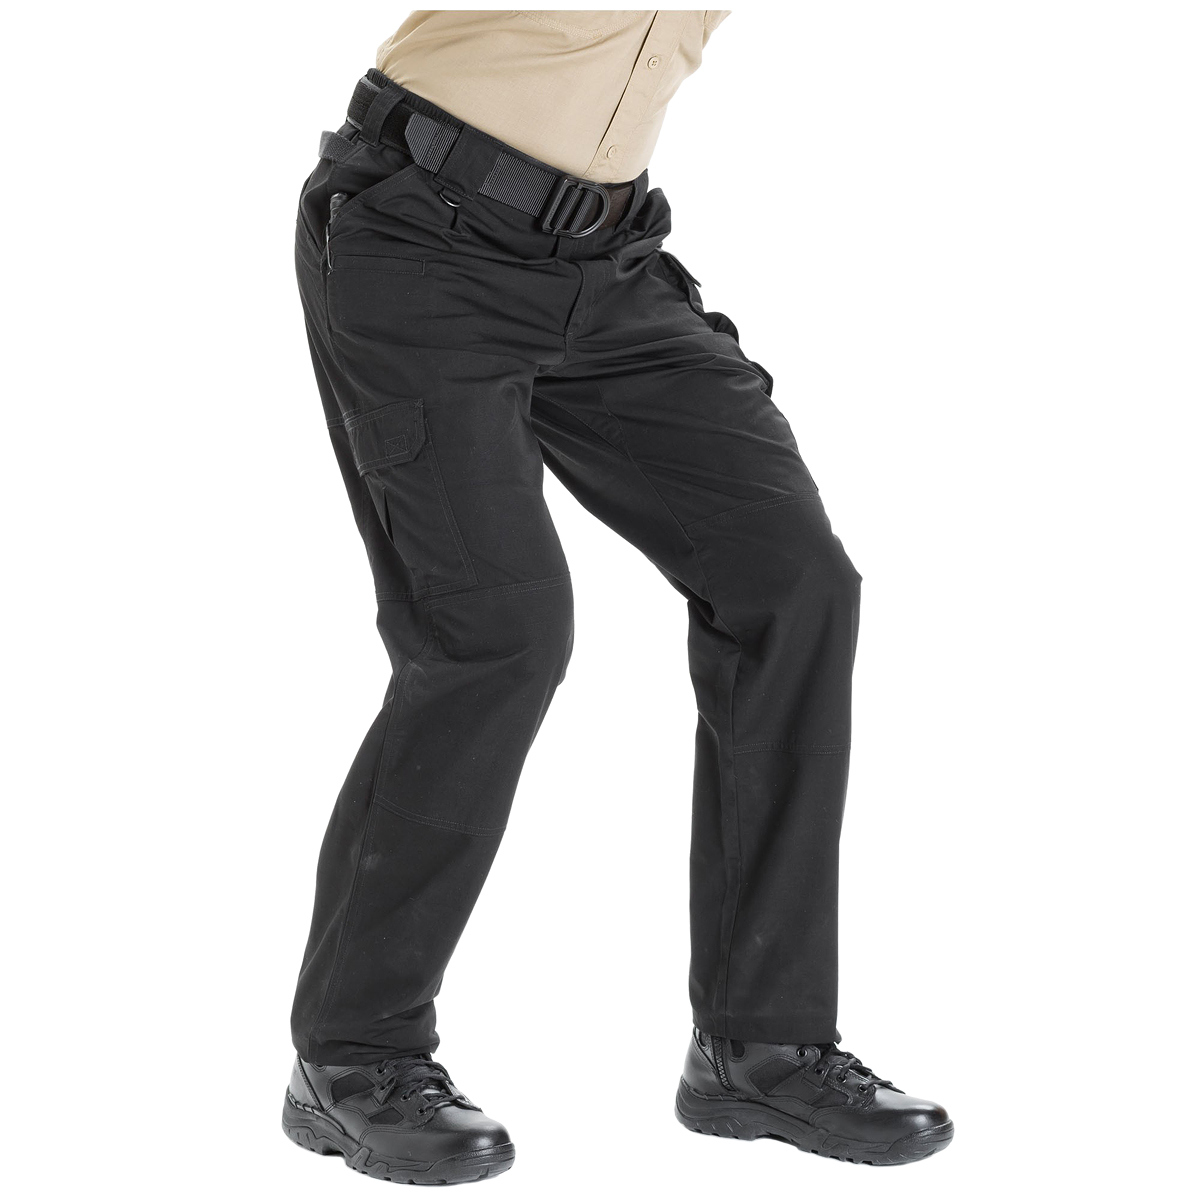 5.11 Taclite Pro Combat Pants Tactical Patrol Cargos Mens Trousers ...